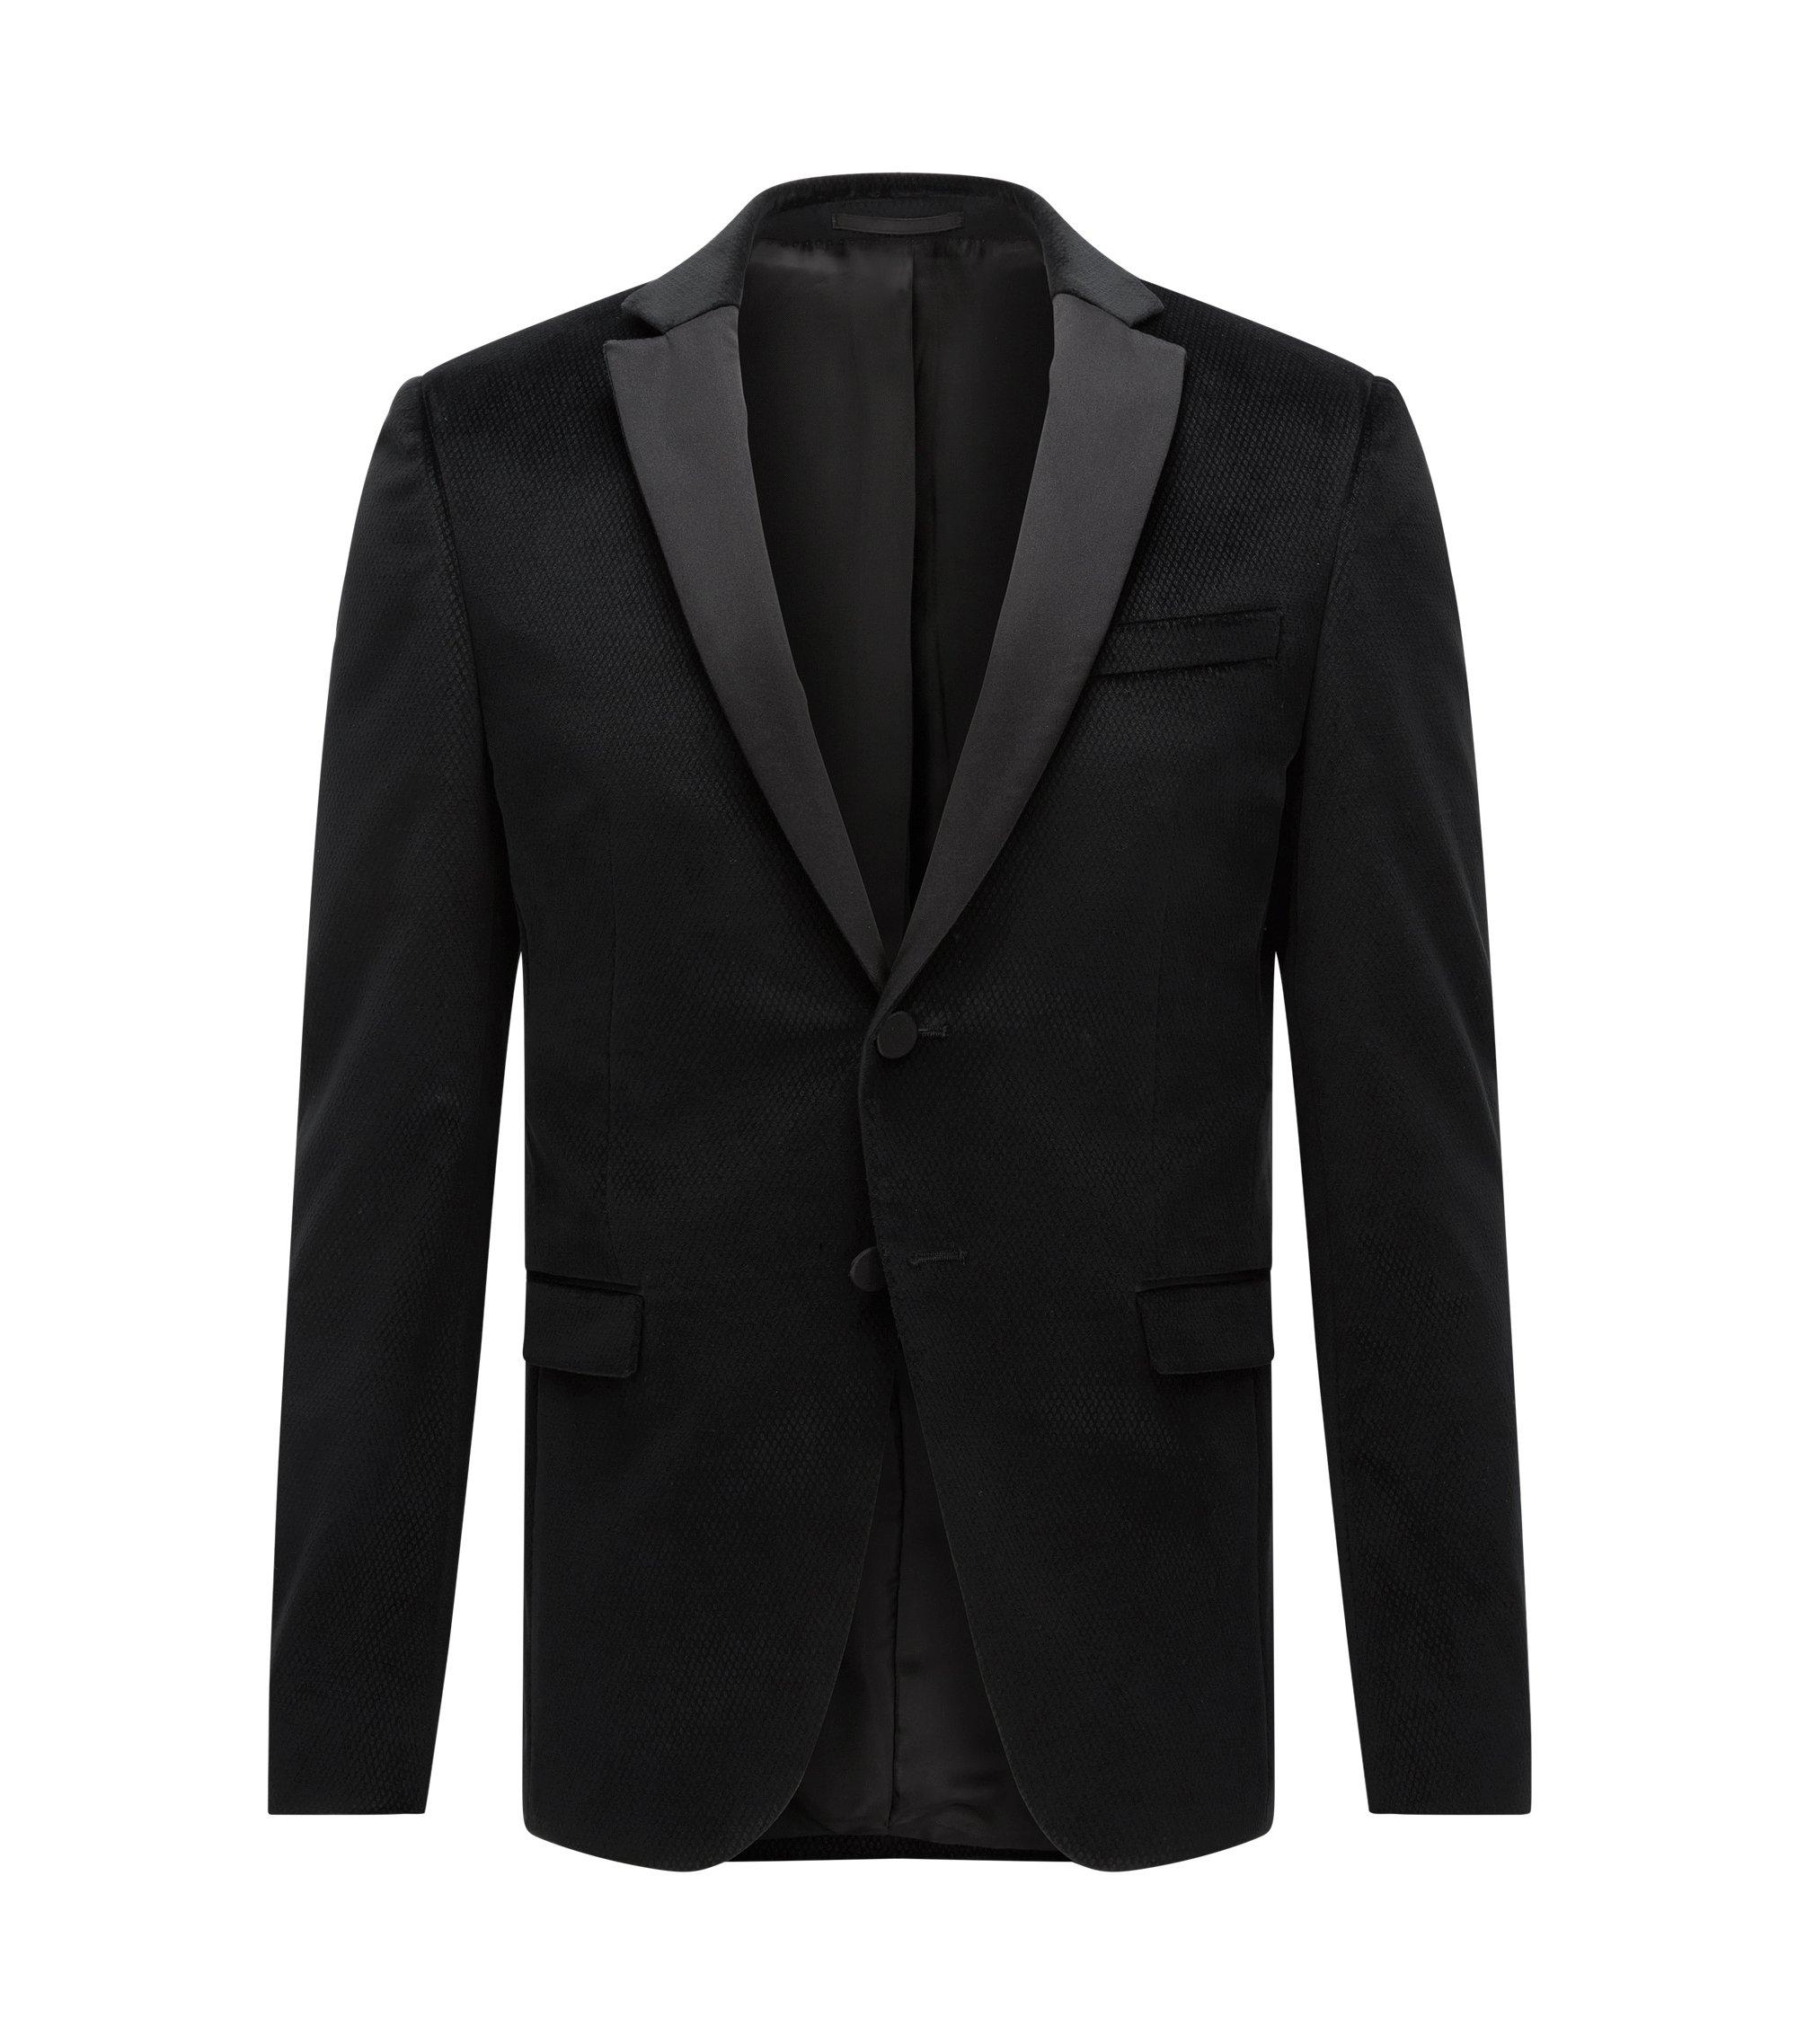 Diamond Cotton Dinner Jacket, Extra Slim Fit   Rainald, Black